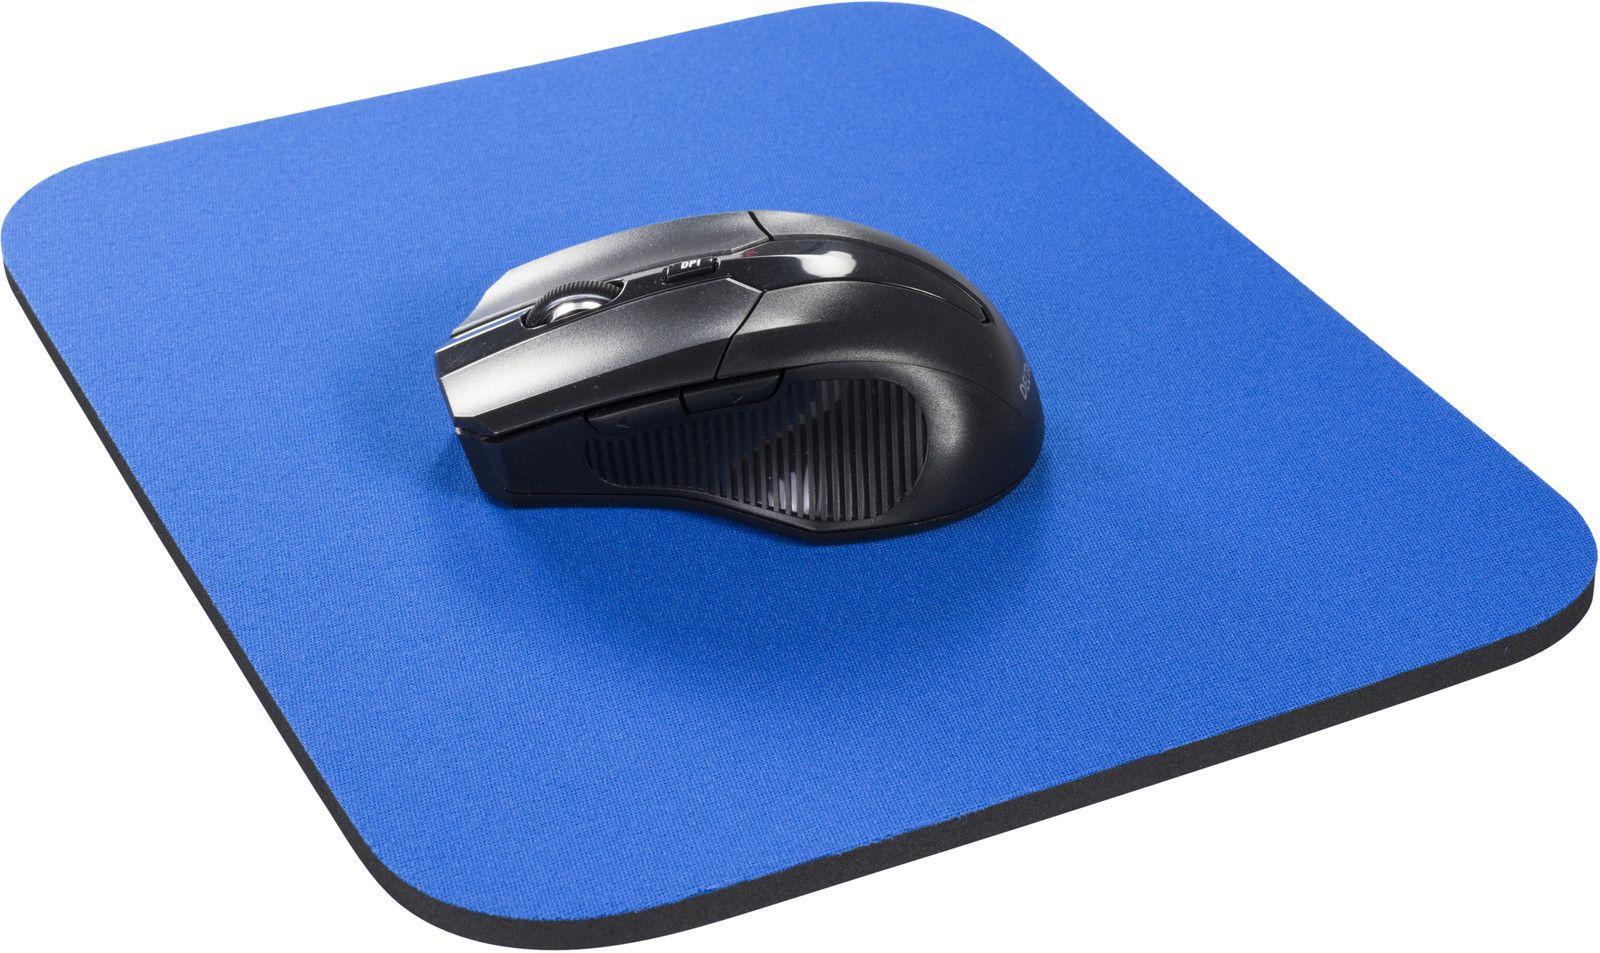 Penclic Mouse Pad M2 - Blå